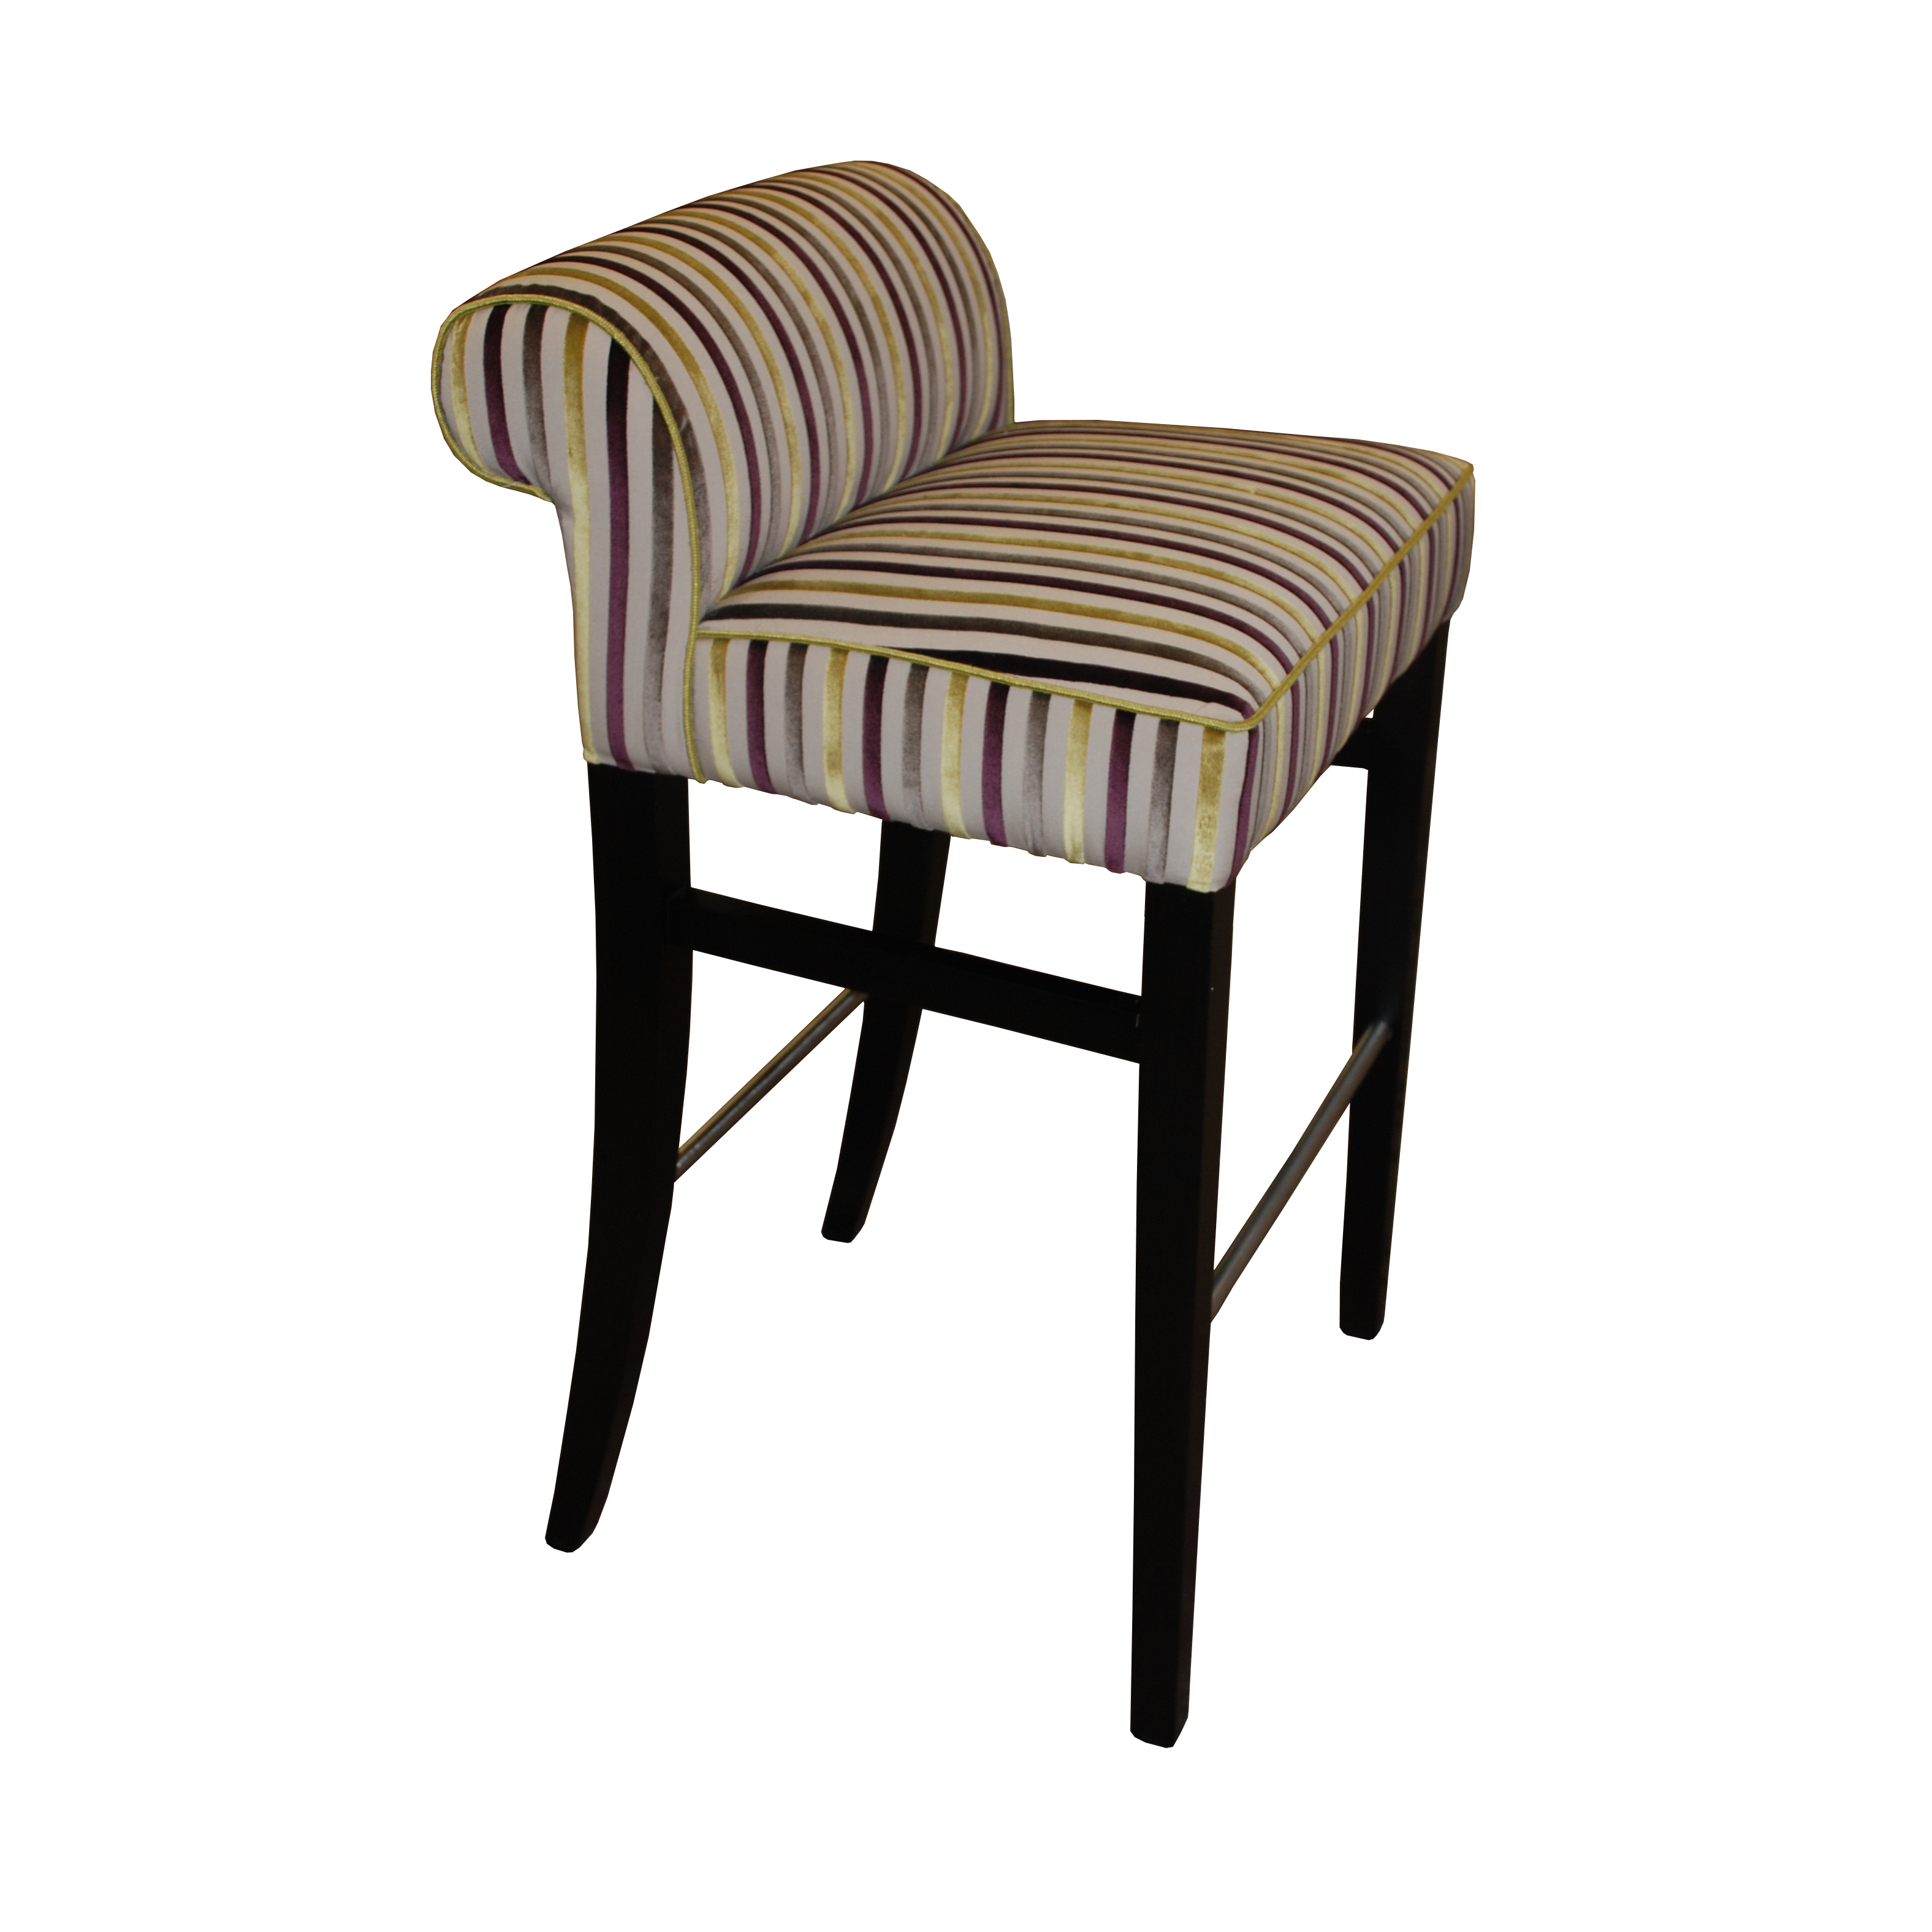 Saltdean bar stool Handmade in UK Chairmaker : Saltdean bar stool from www.chairmaker.co.uk size 3152 x 3152 jpeg 1553kB